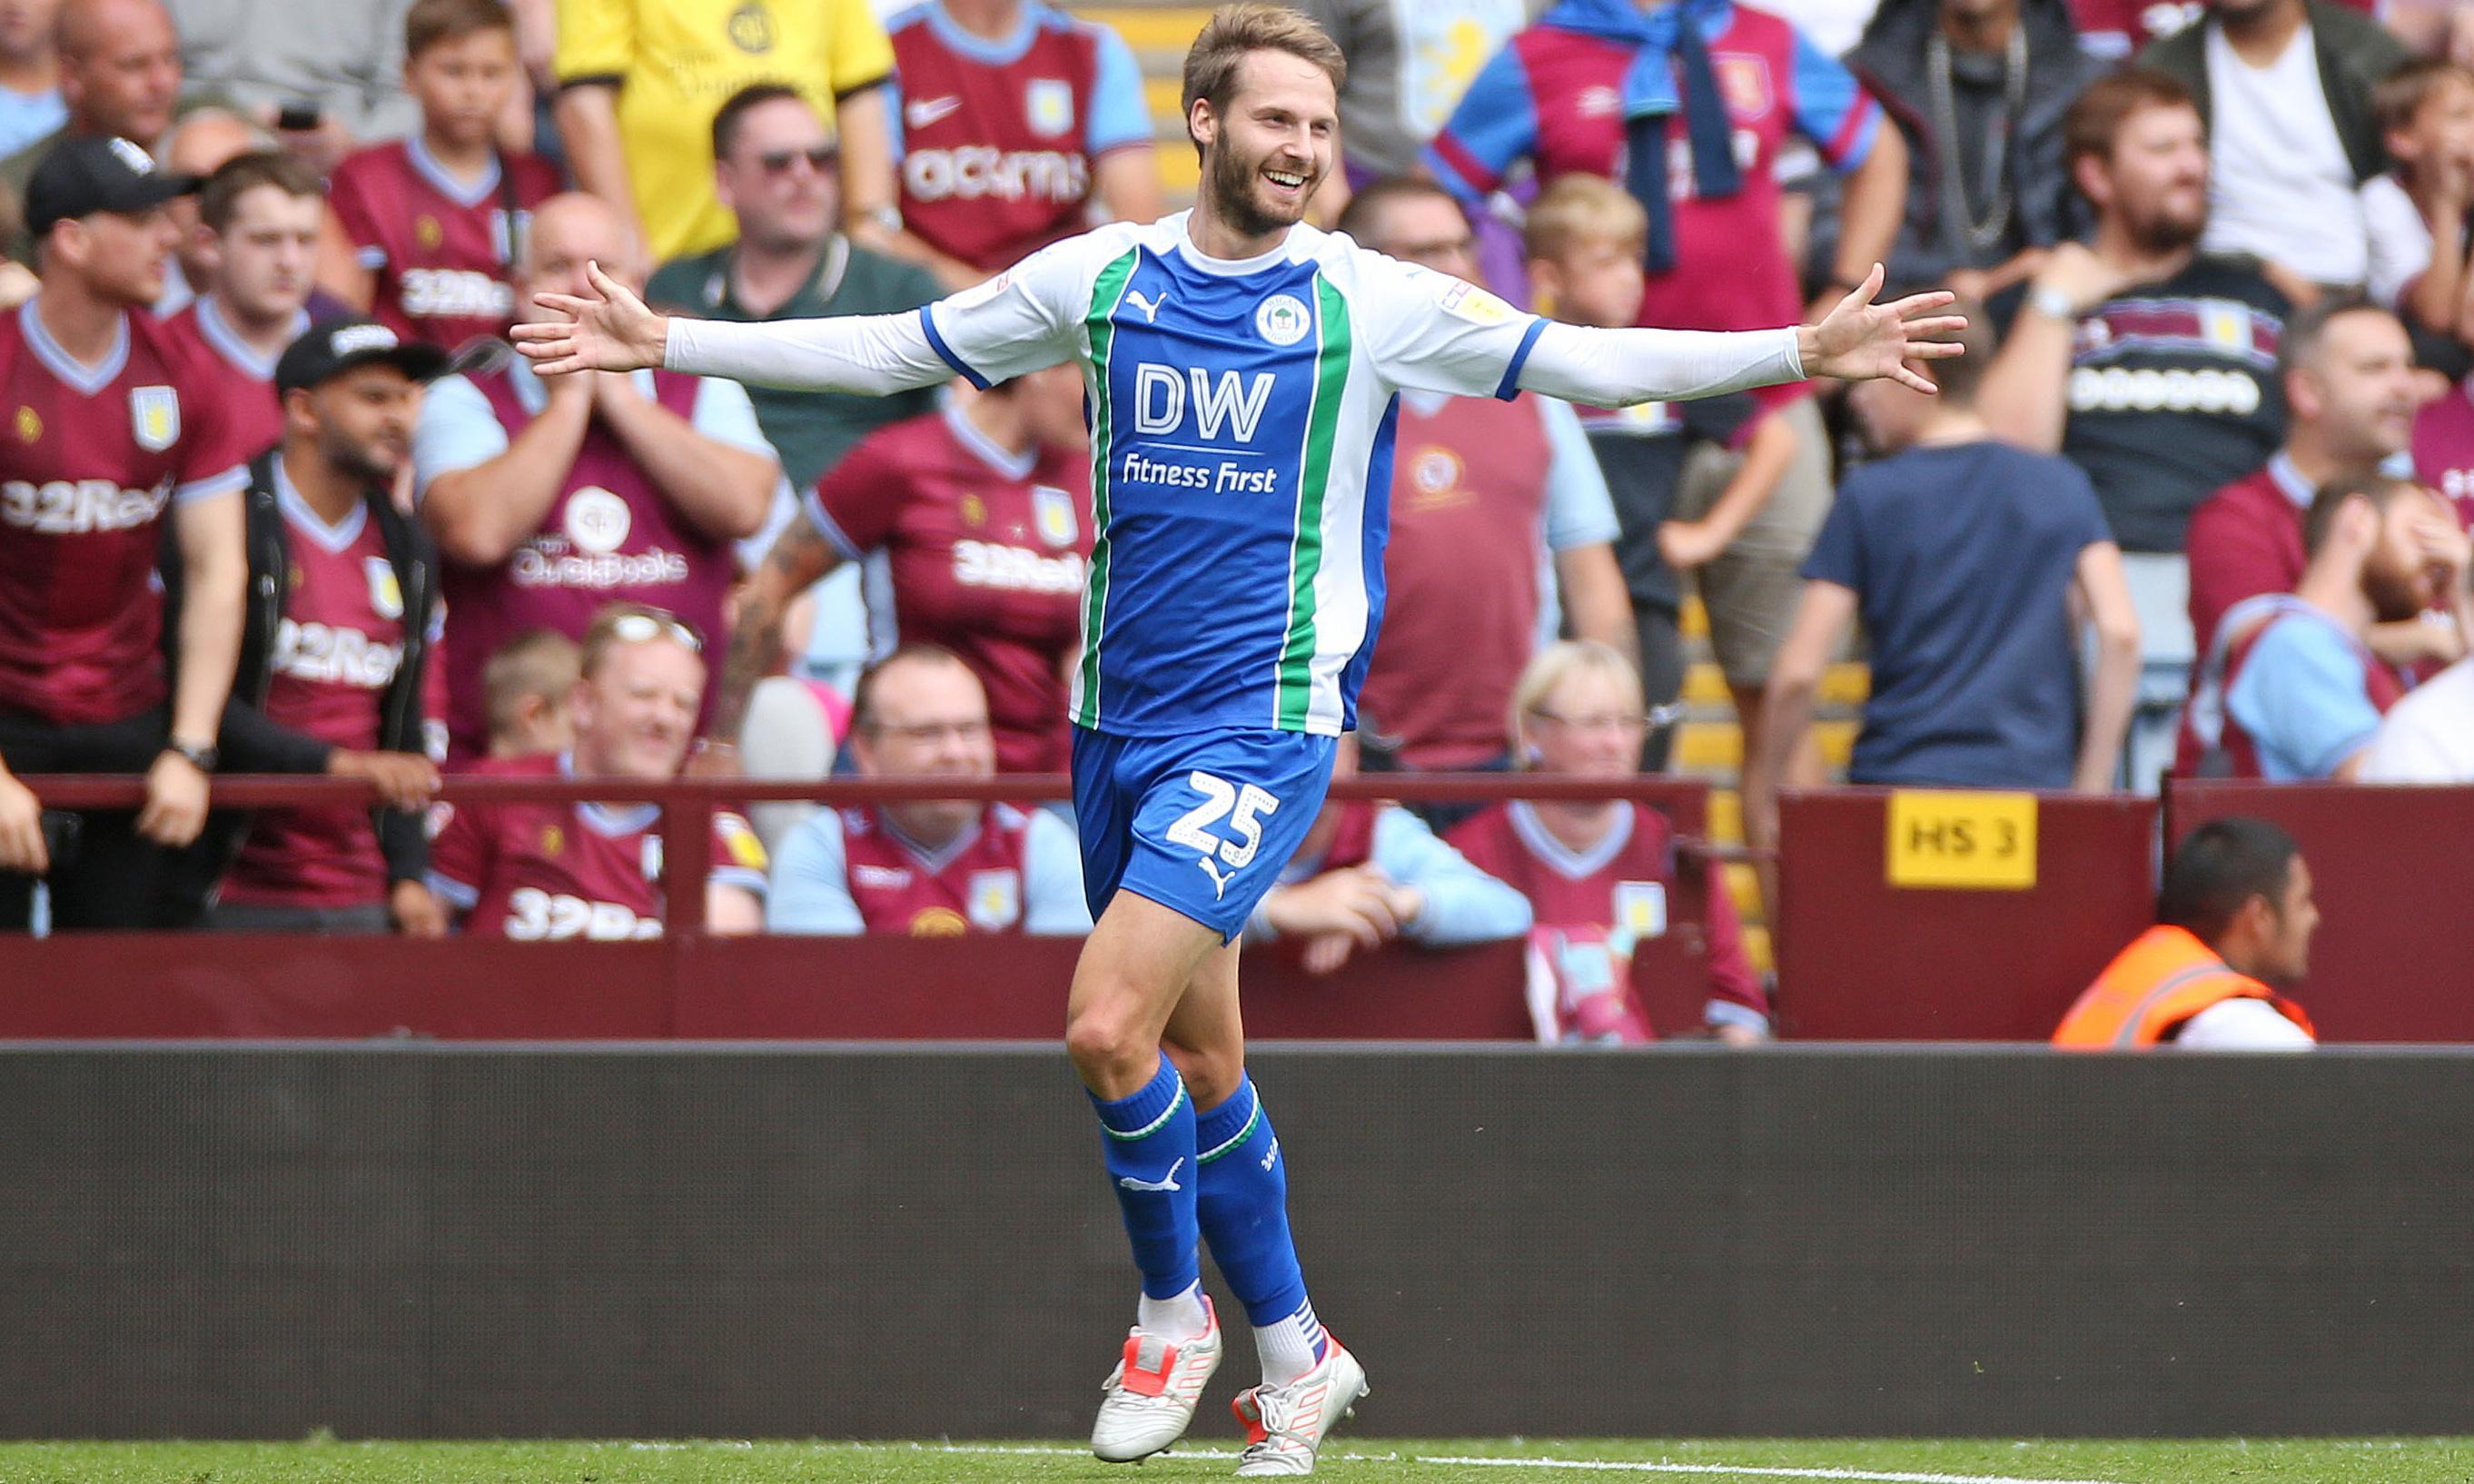 Football transfer rumours: Wigan Athletic's Nick Powell to Leipzig?